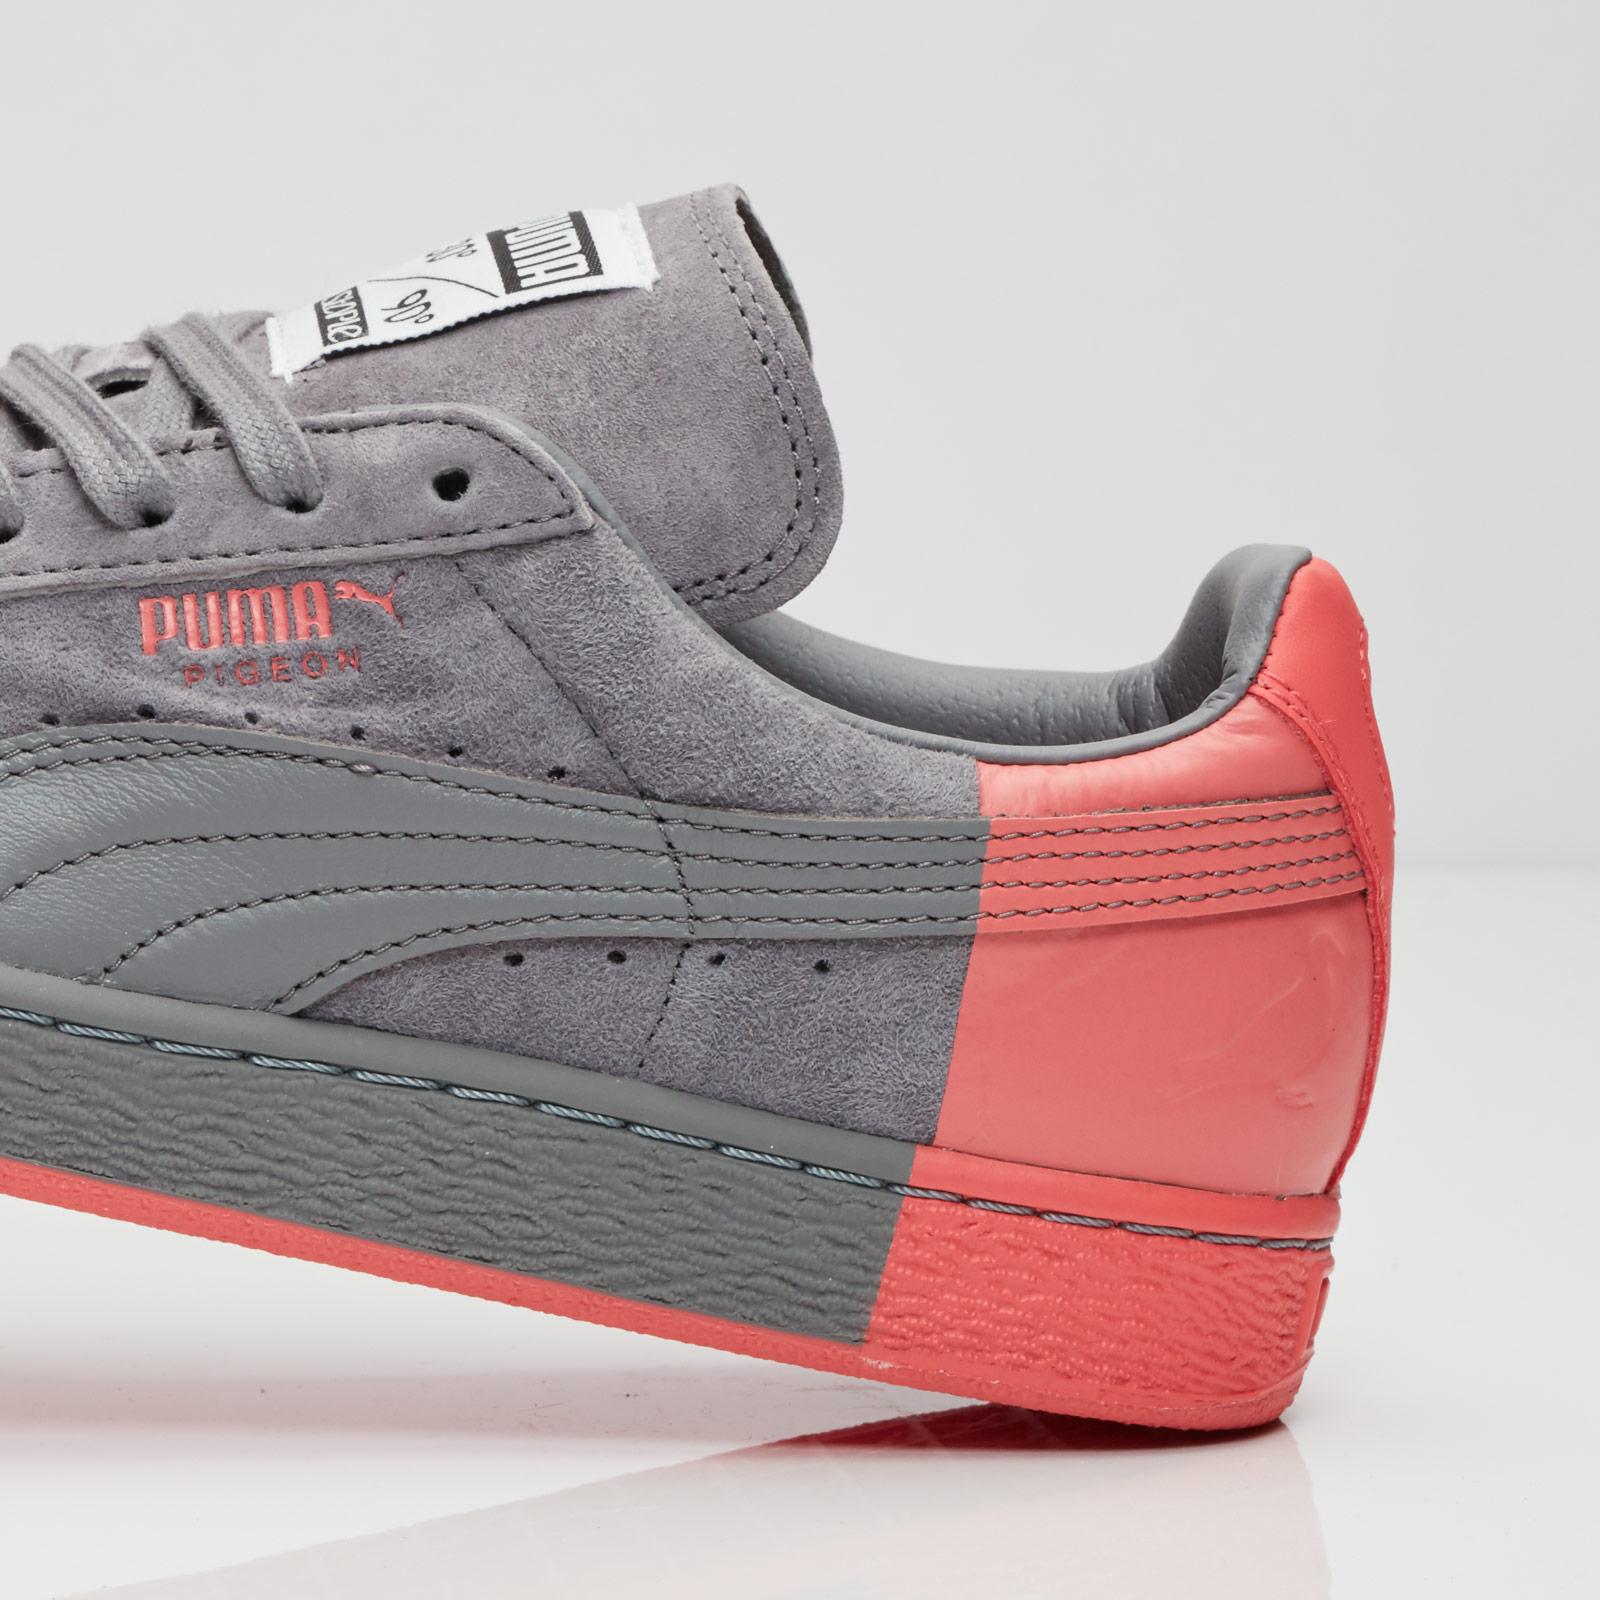 da798103e652e2 Puma Suede x Staple - 361617-03 - Sneakersnstuff